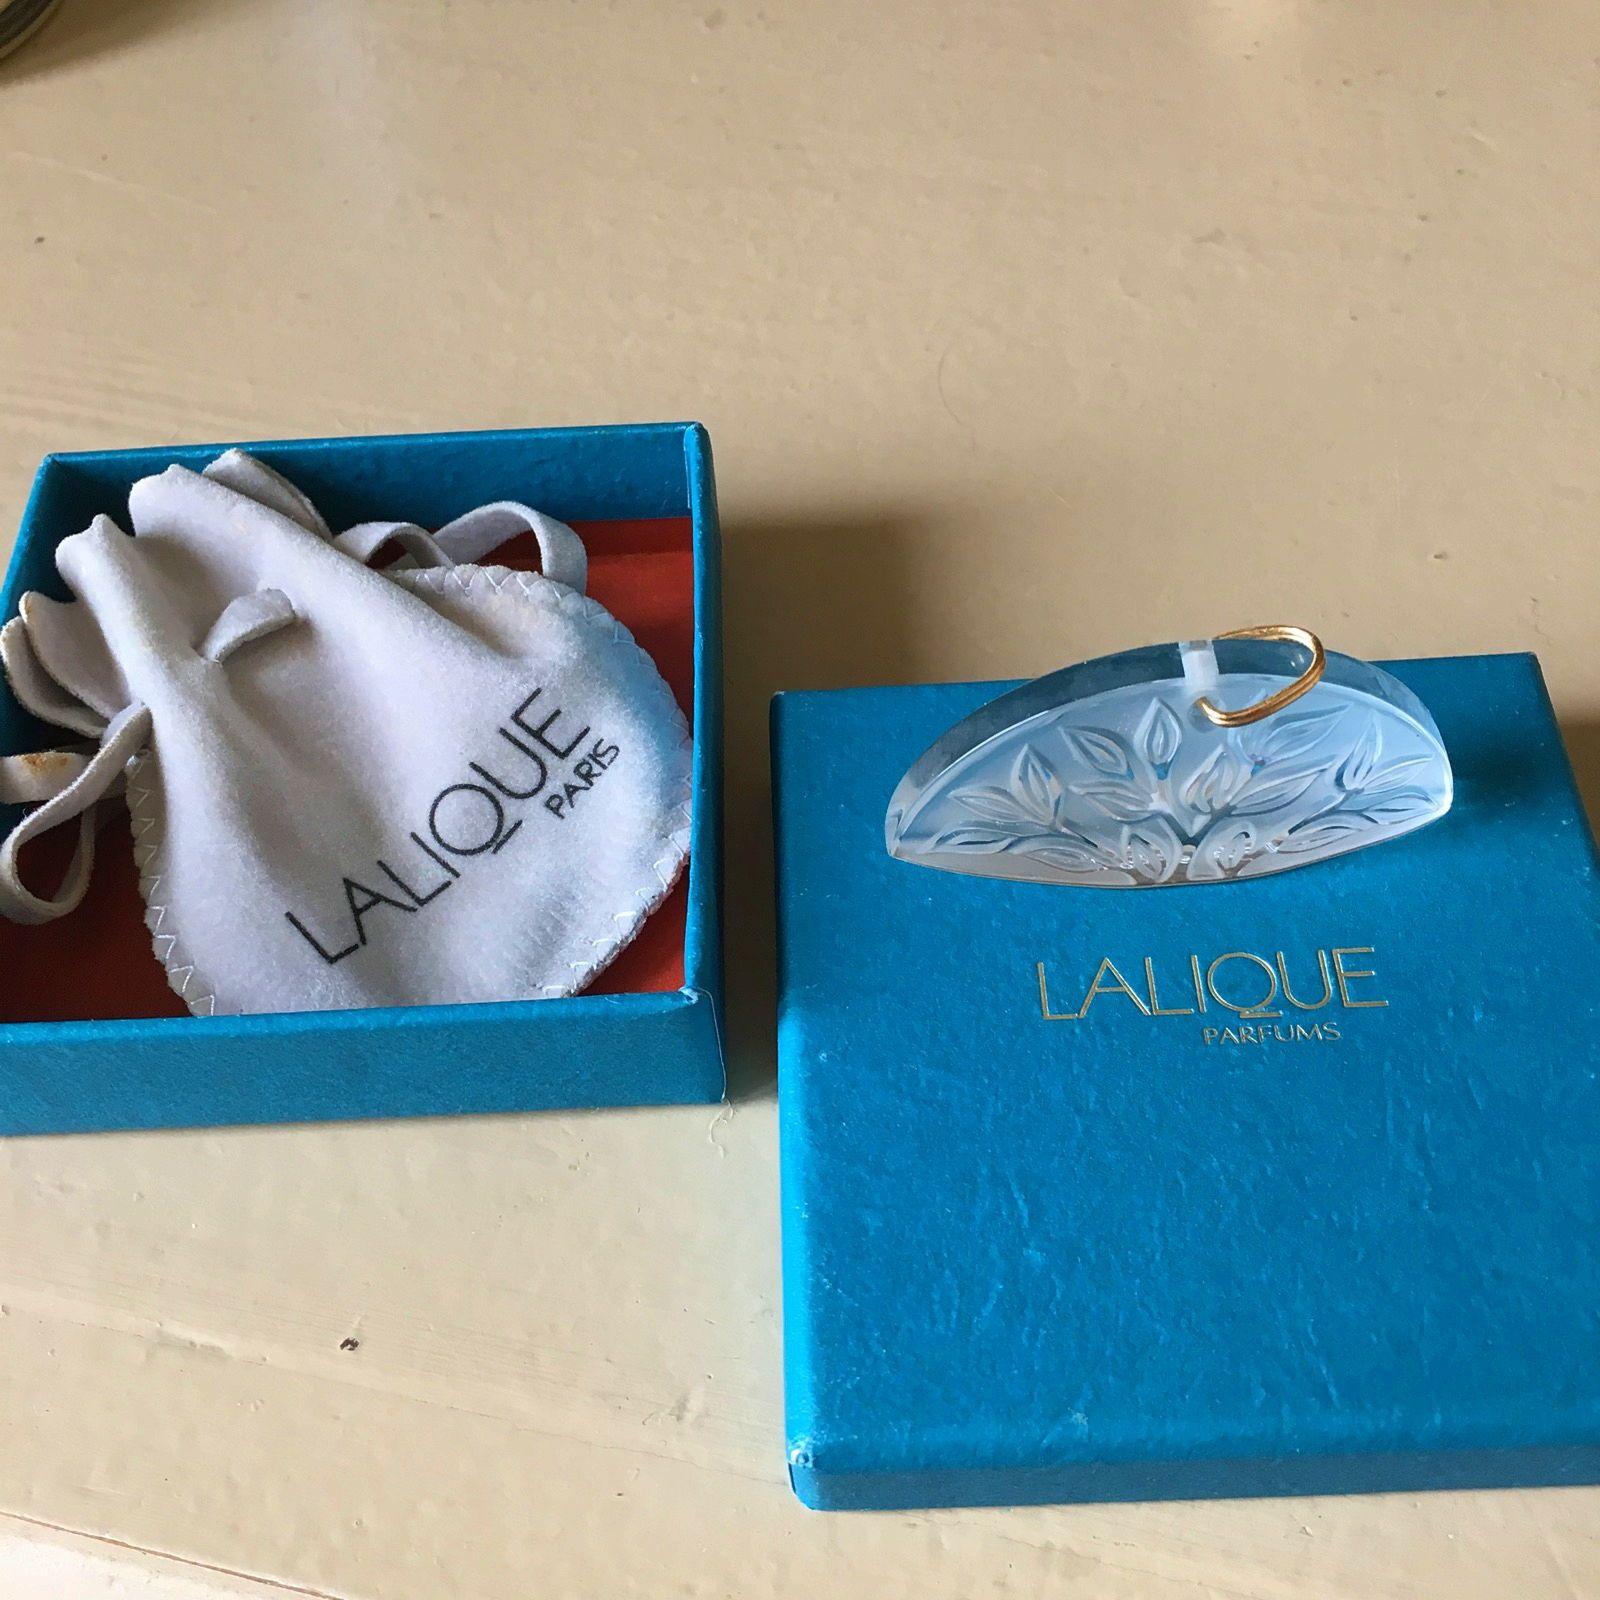 Vends pendentif Lalique cristal